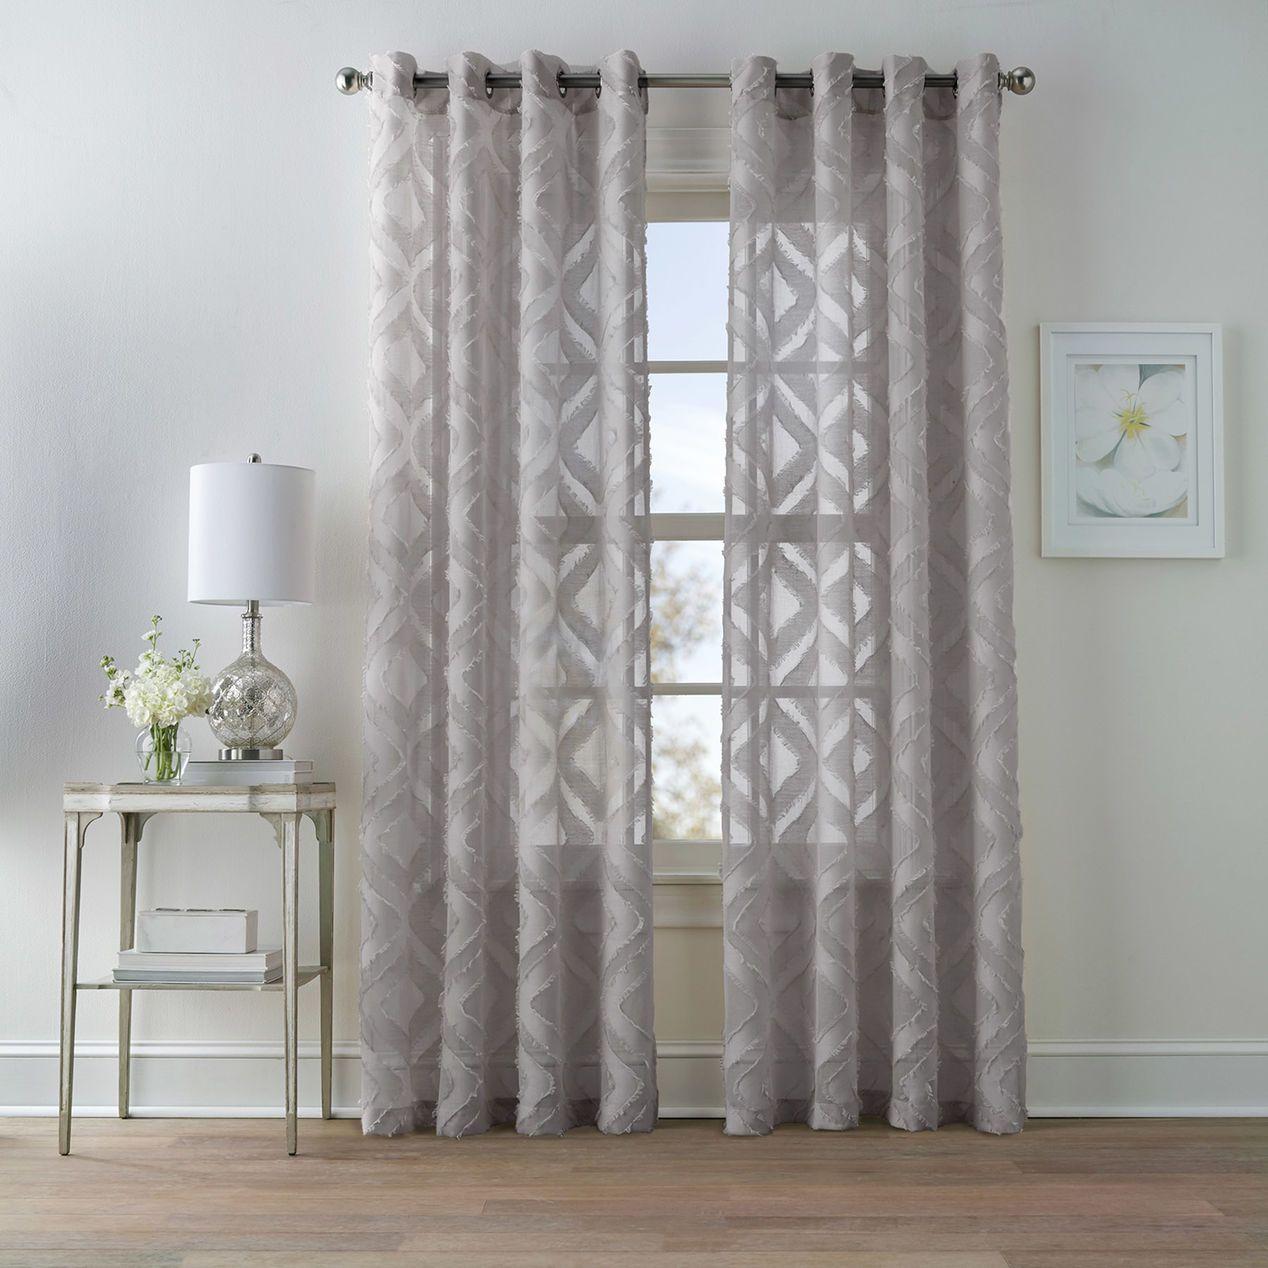 Dillon Grey Grommet Curtain Panel 84 Grey Curtains Living Room Grommet Curtains Panel Curtains